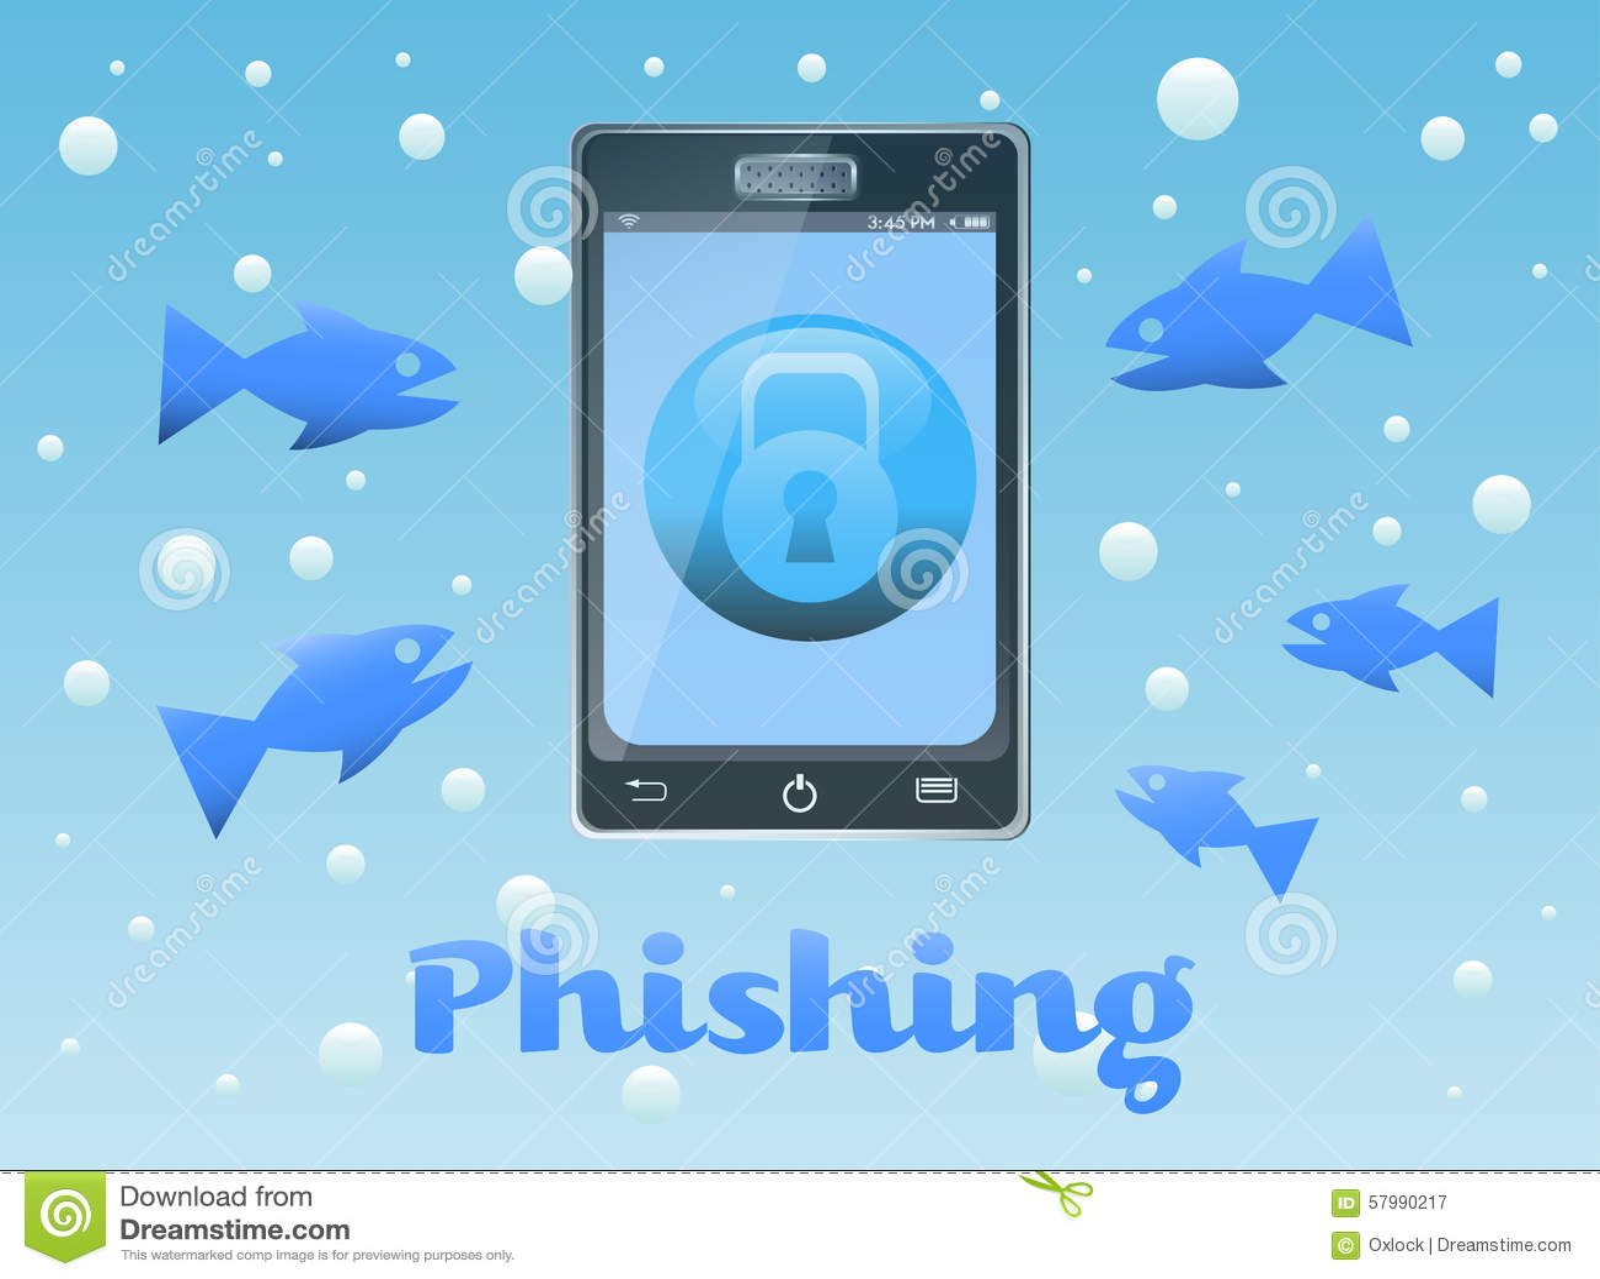 Phishing Stock Vector Image 57990217